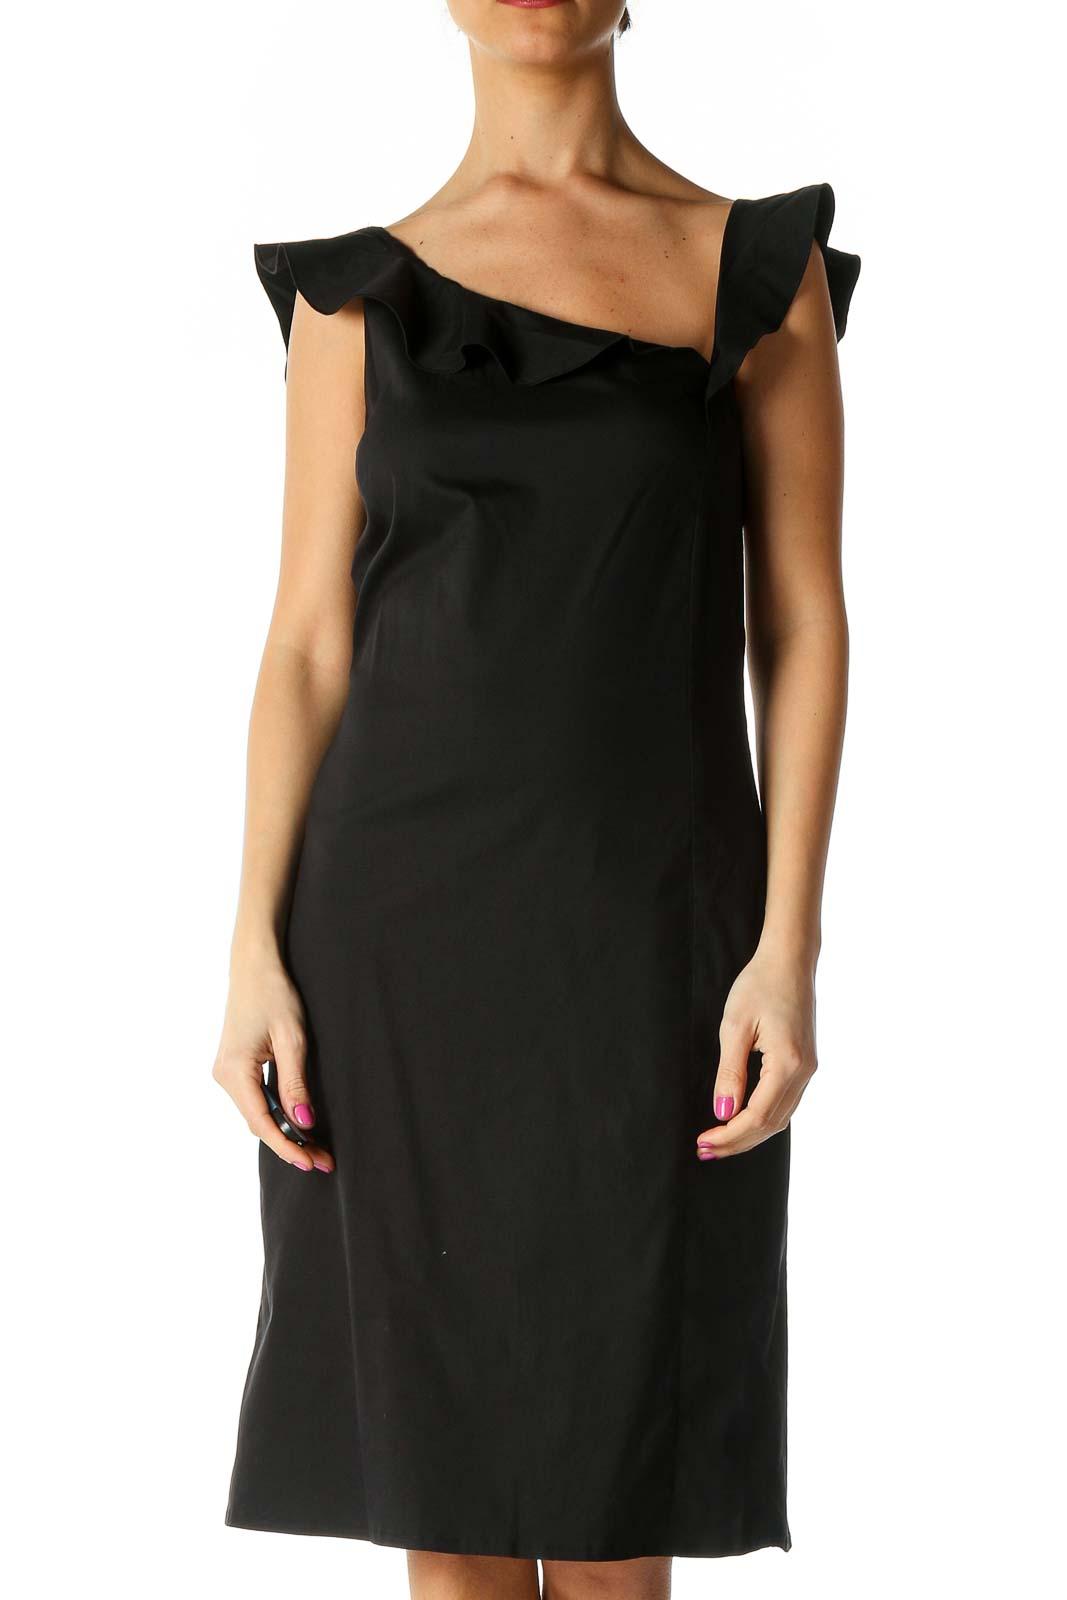 Black Solid Retro A-Line Dress Front